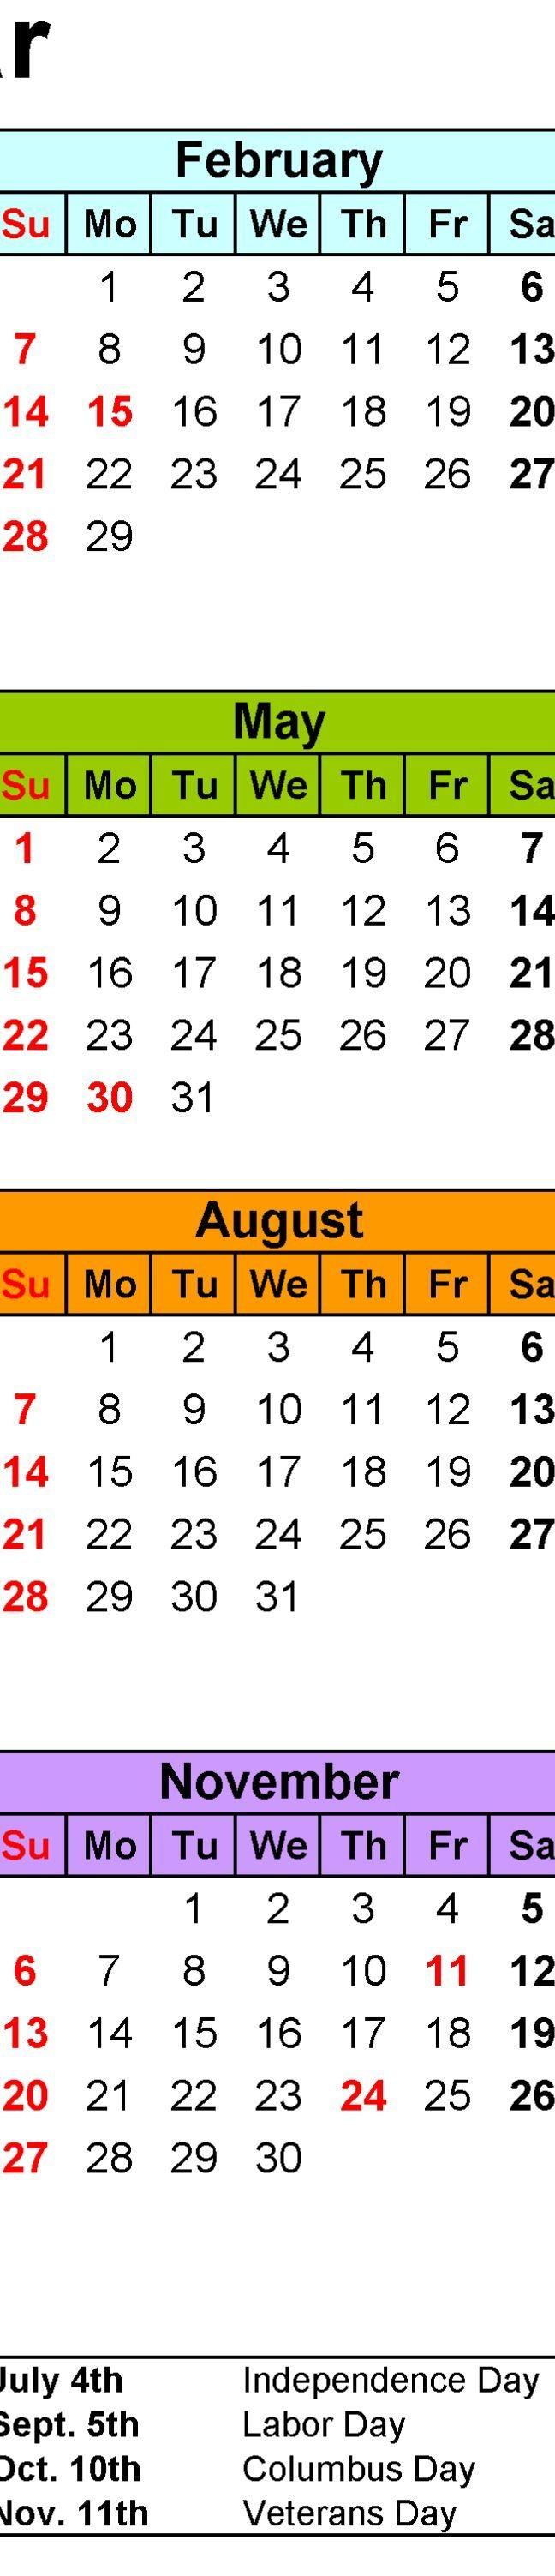 0e0d2f715e69d33e977d2988e05b642e printable monthly calendar calendar templates